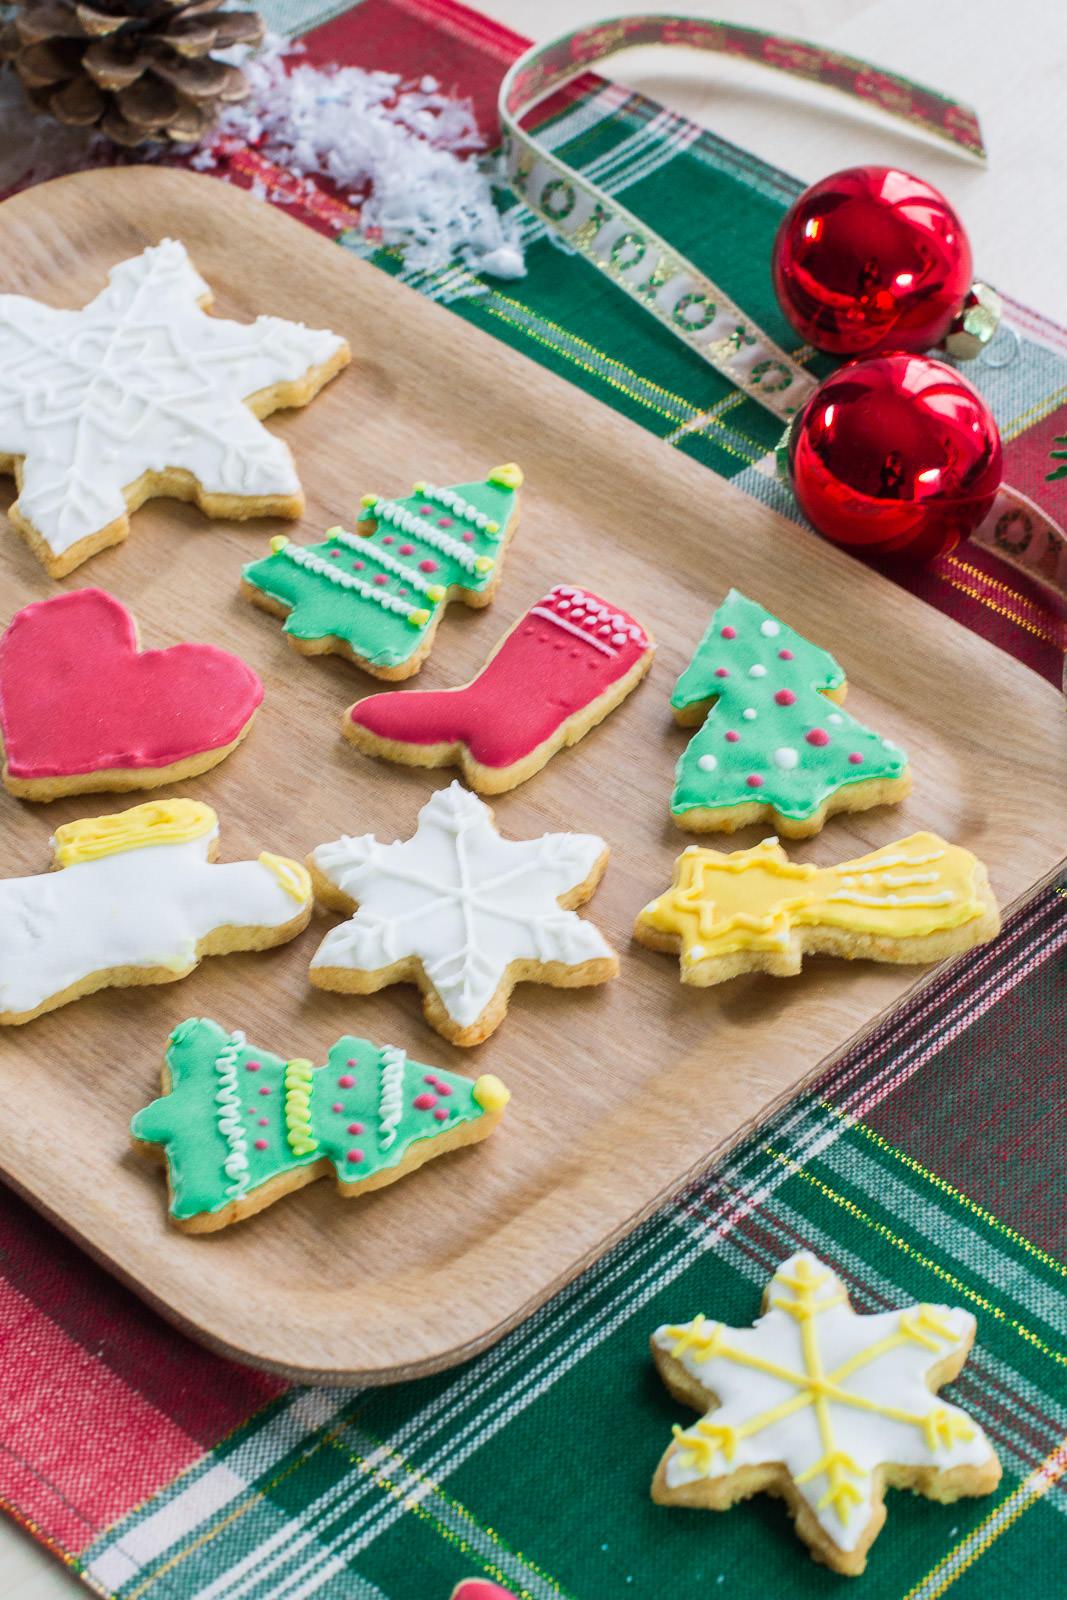 Blog-mode-and-the-city-food-sablés-de-noël-christmas-cookies